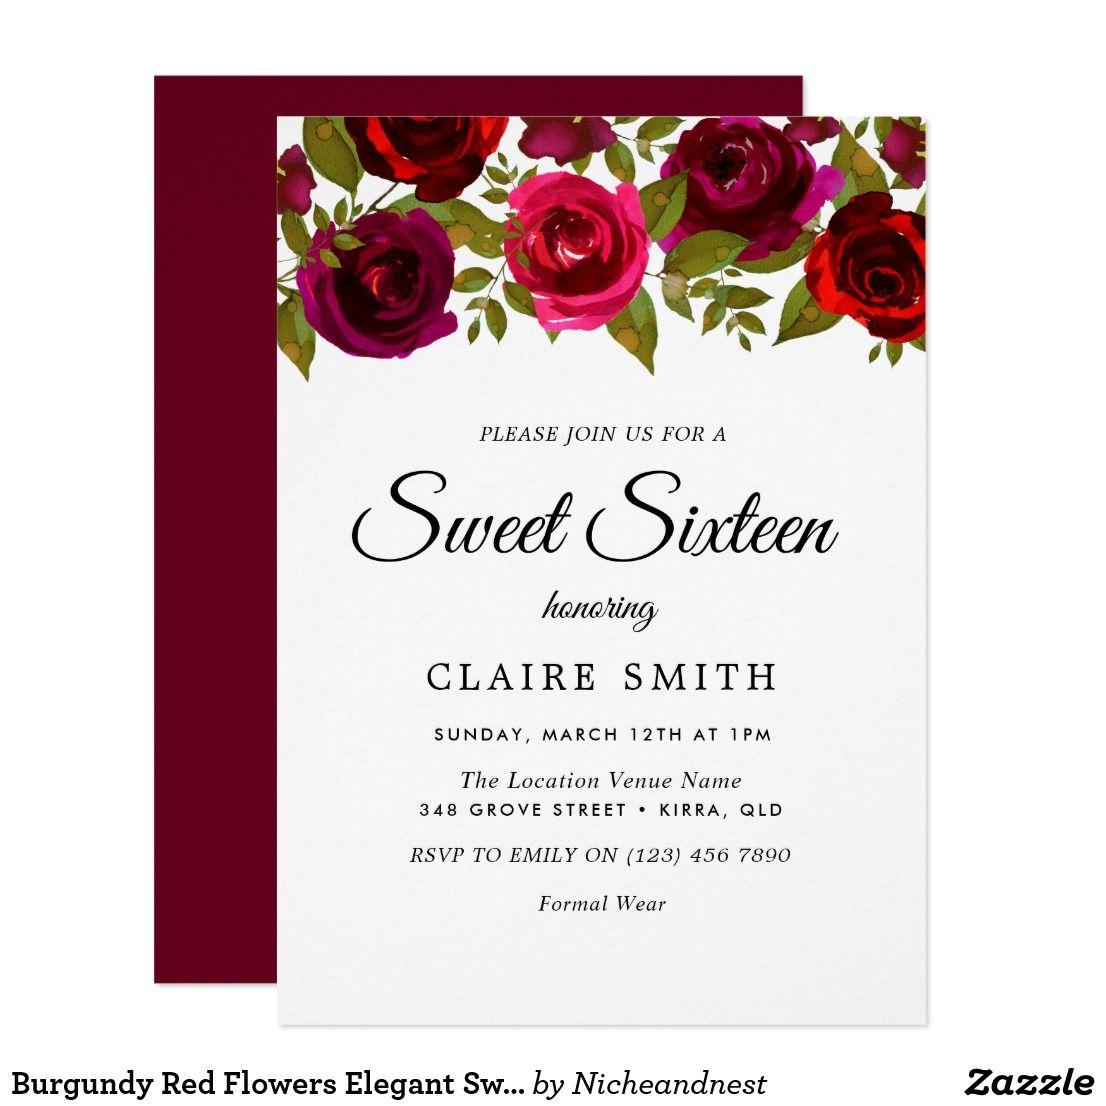 Burgundy Red Flowers Elegant Sweet 16 Invite Zazzle Com In 2019